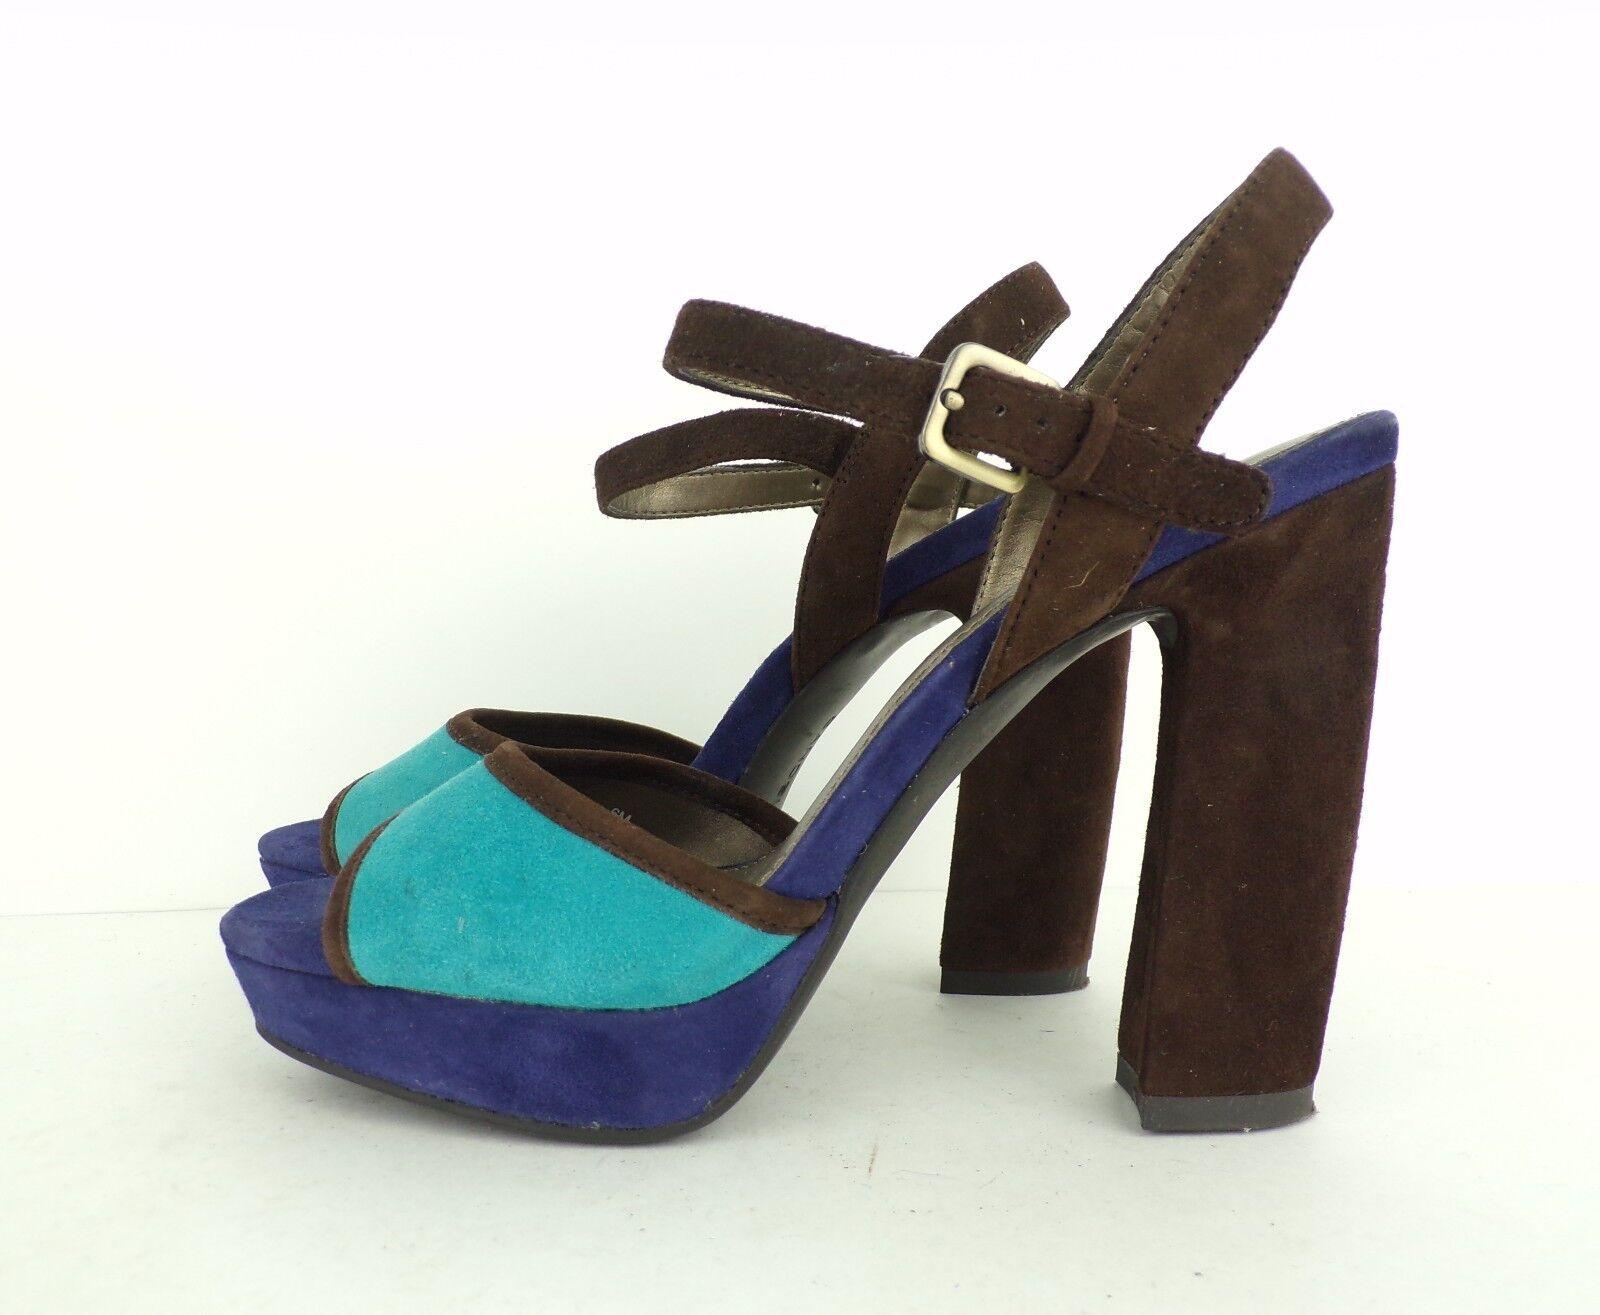 BANDOLINO Braun & Blau Suede Open Toe Strappy Heels Sandales Open Toe Schuhes 6 M